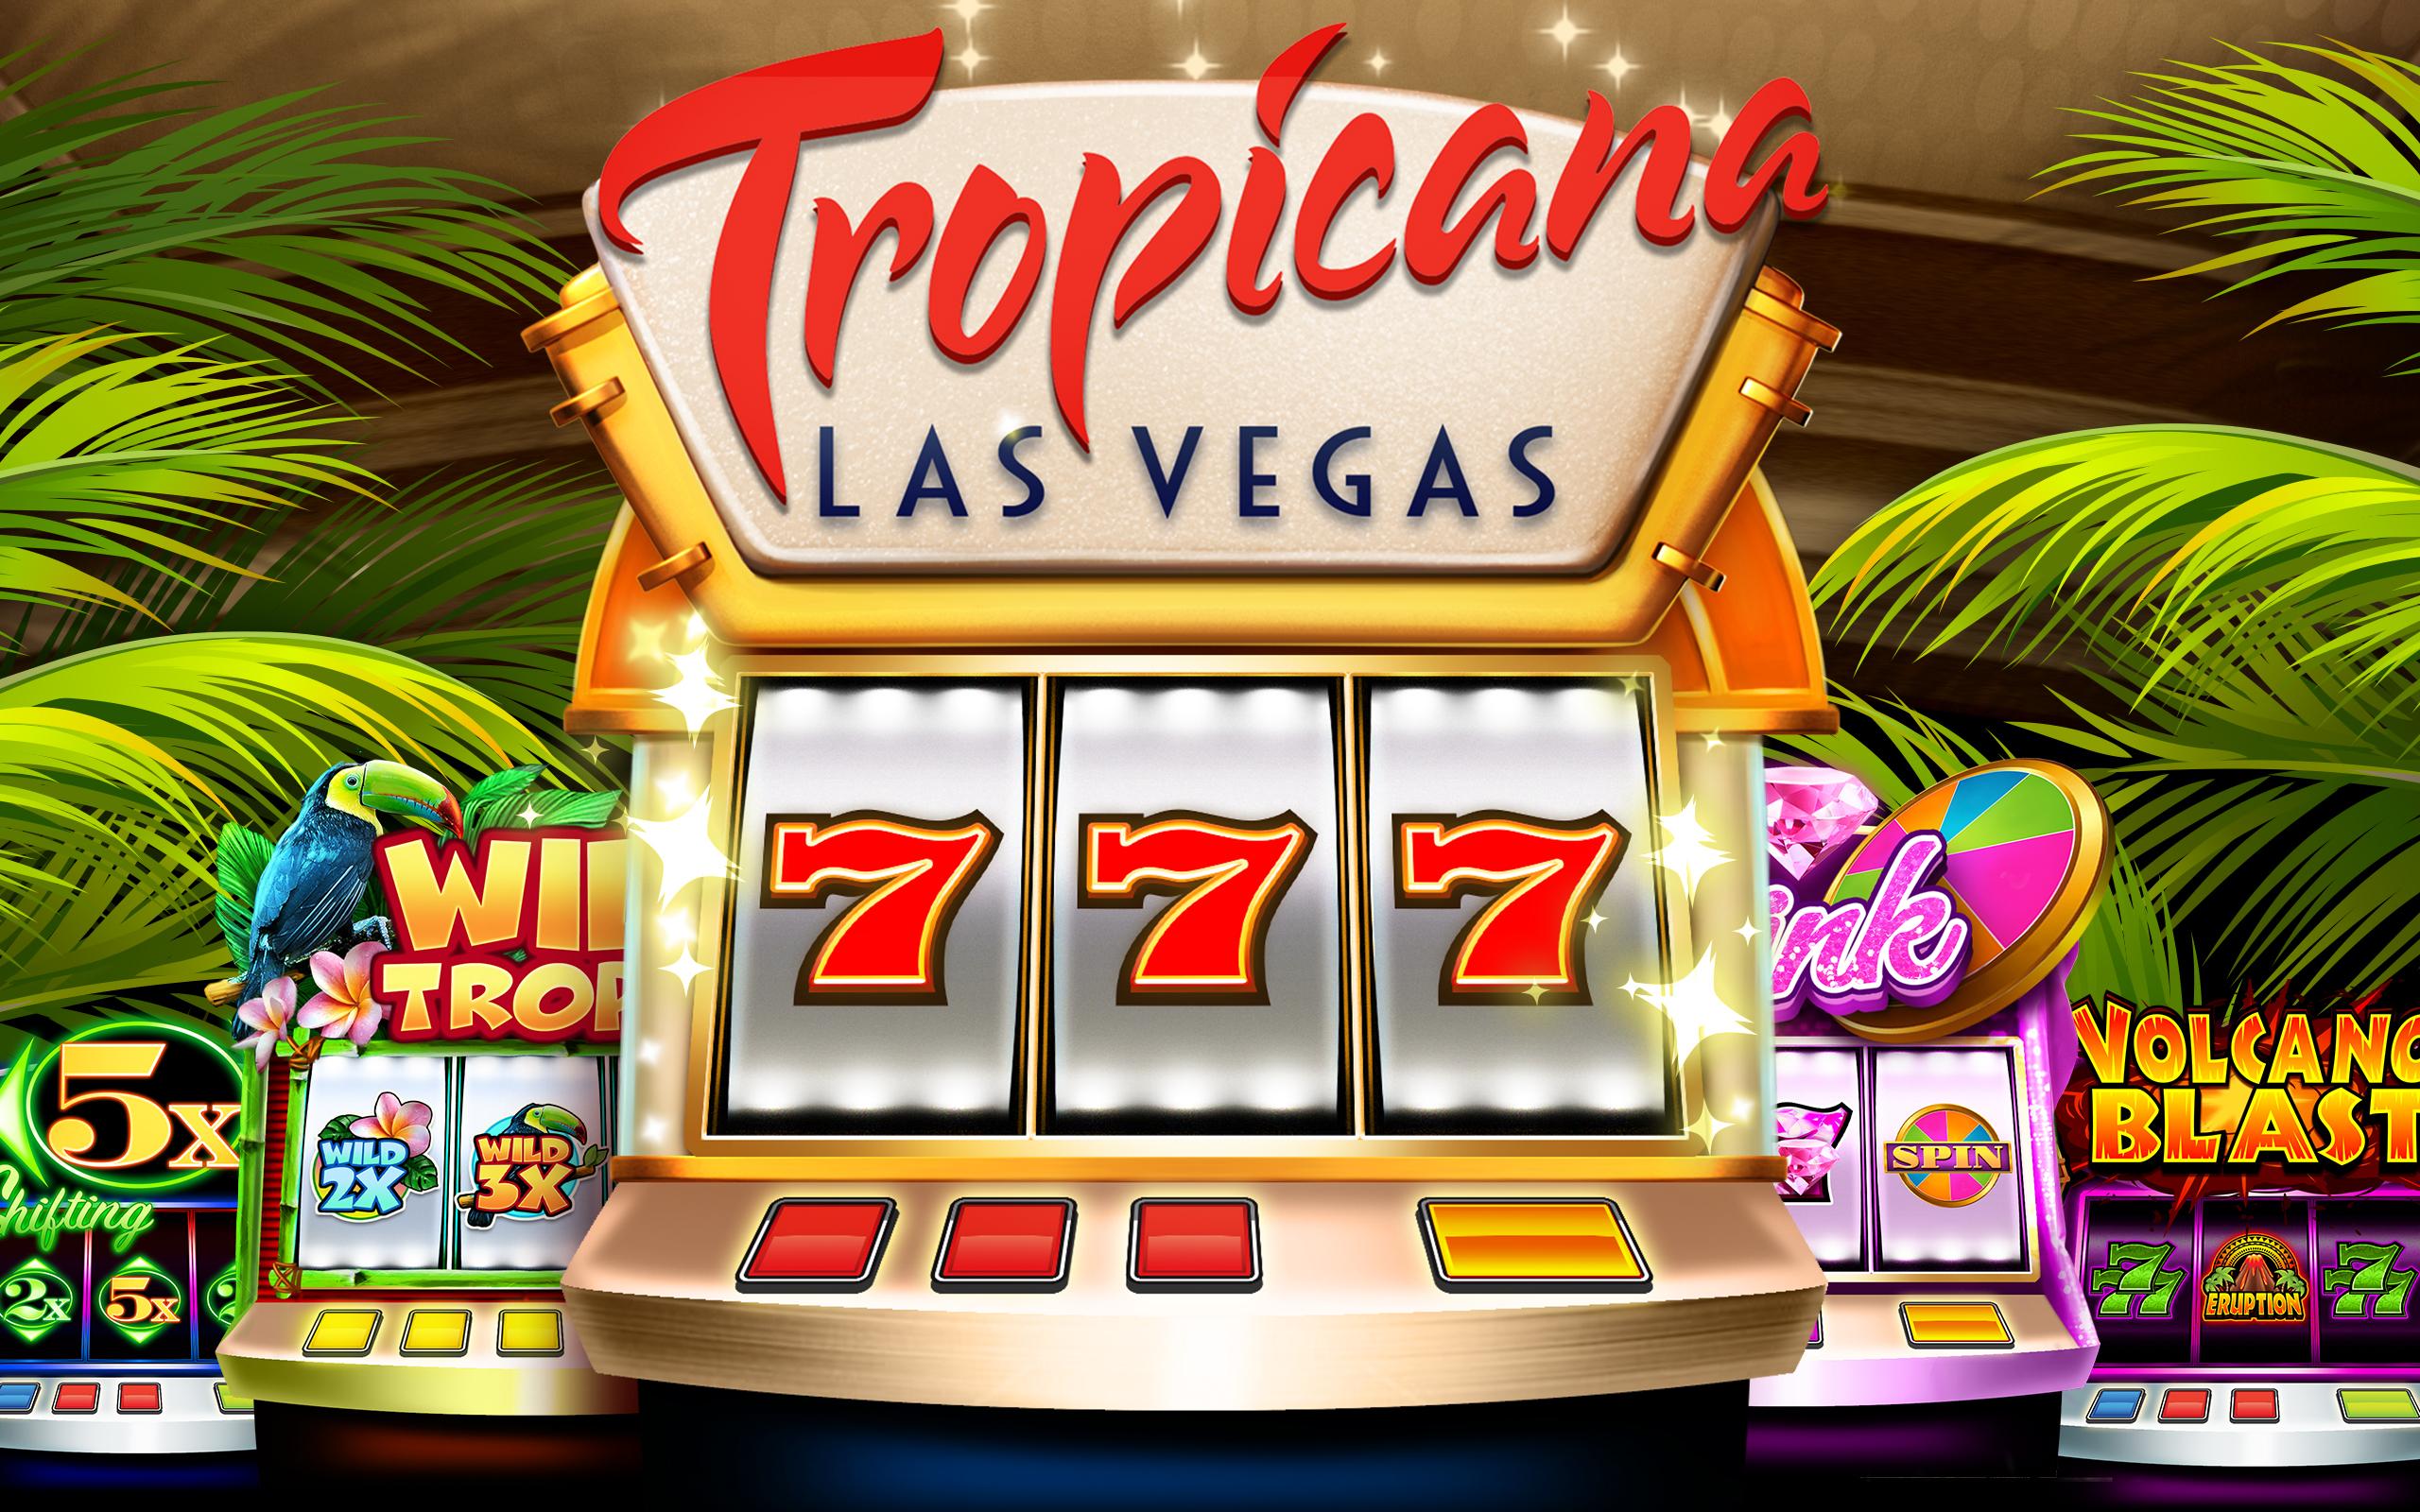 Las vegas casino with old slot machines